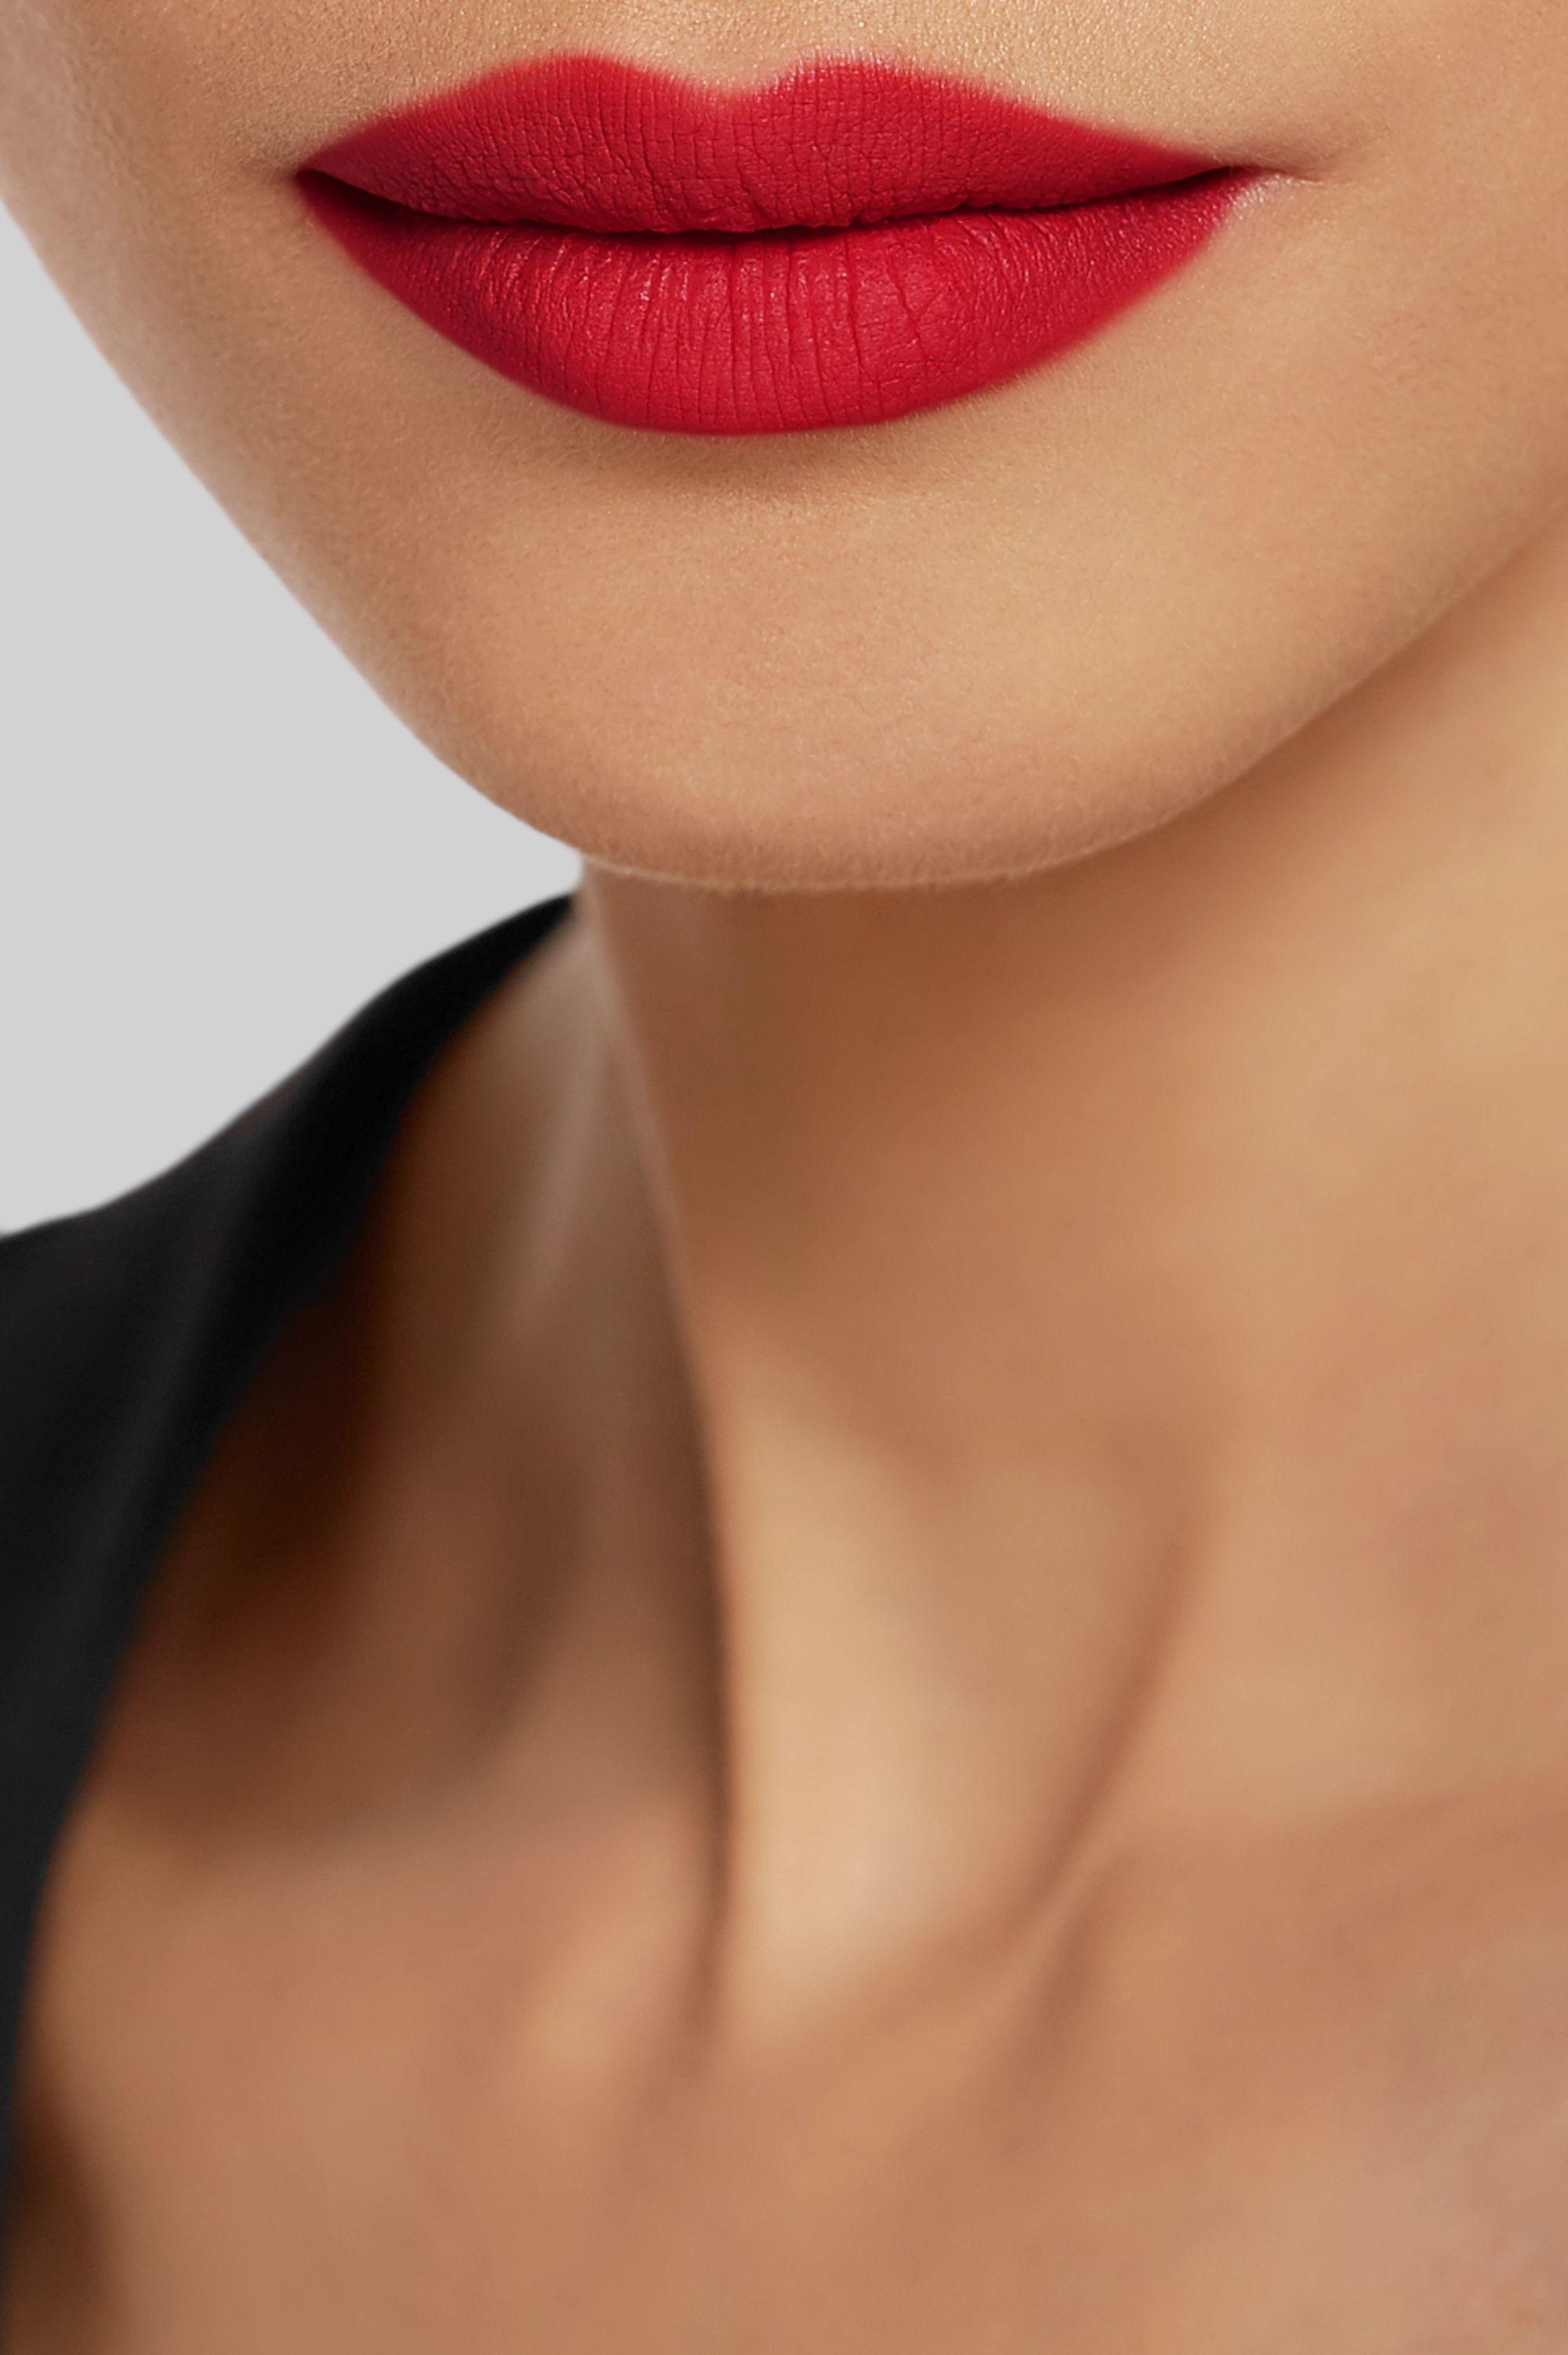 Christian Louboutin Beauty Silky Satin Lip Colour - Lusita